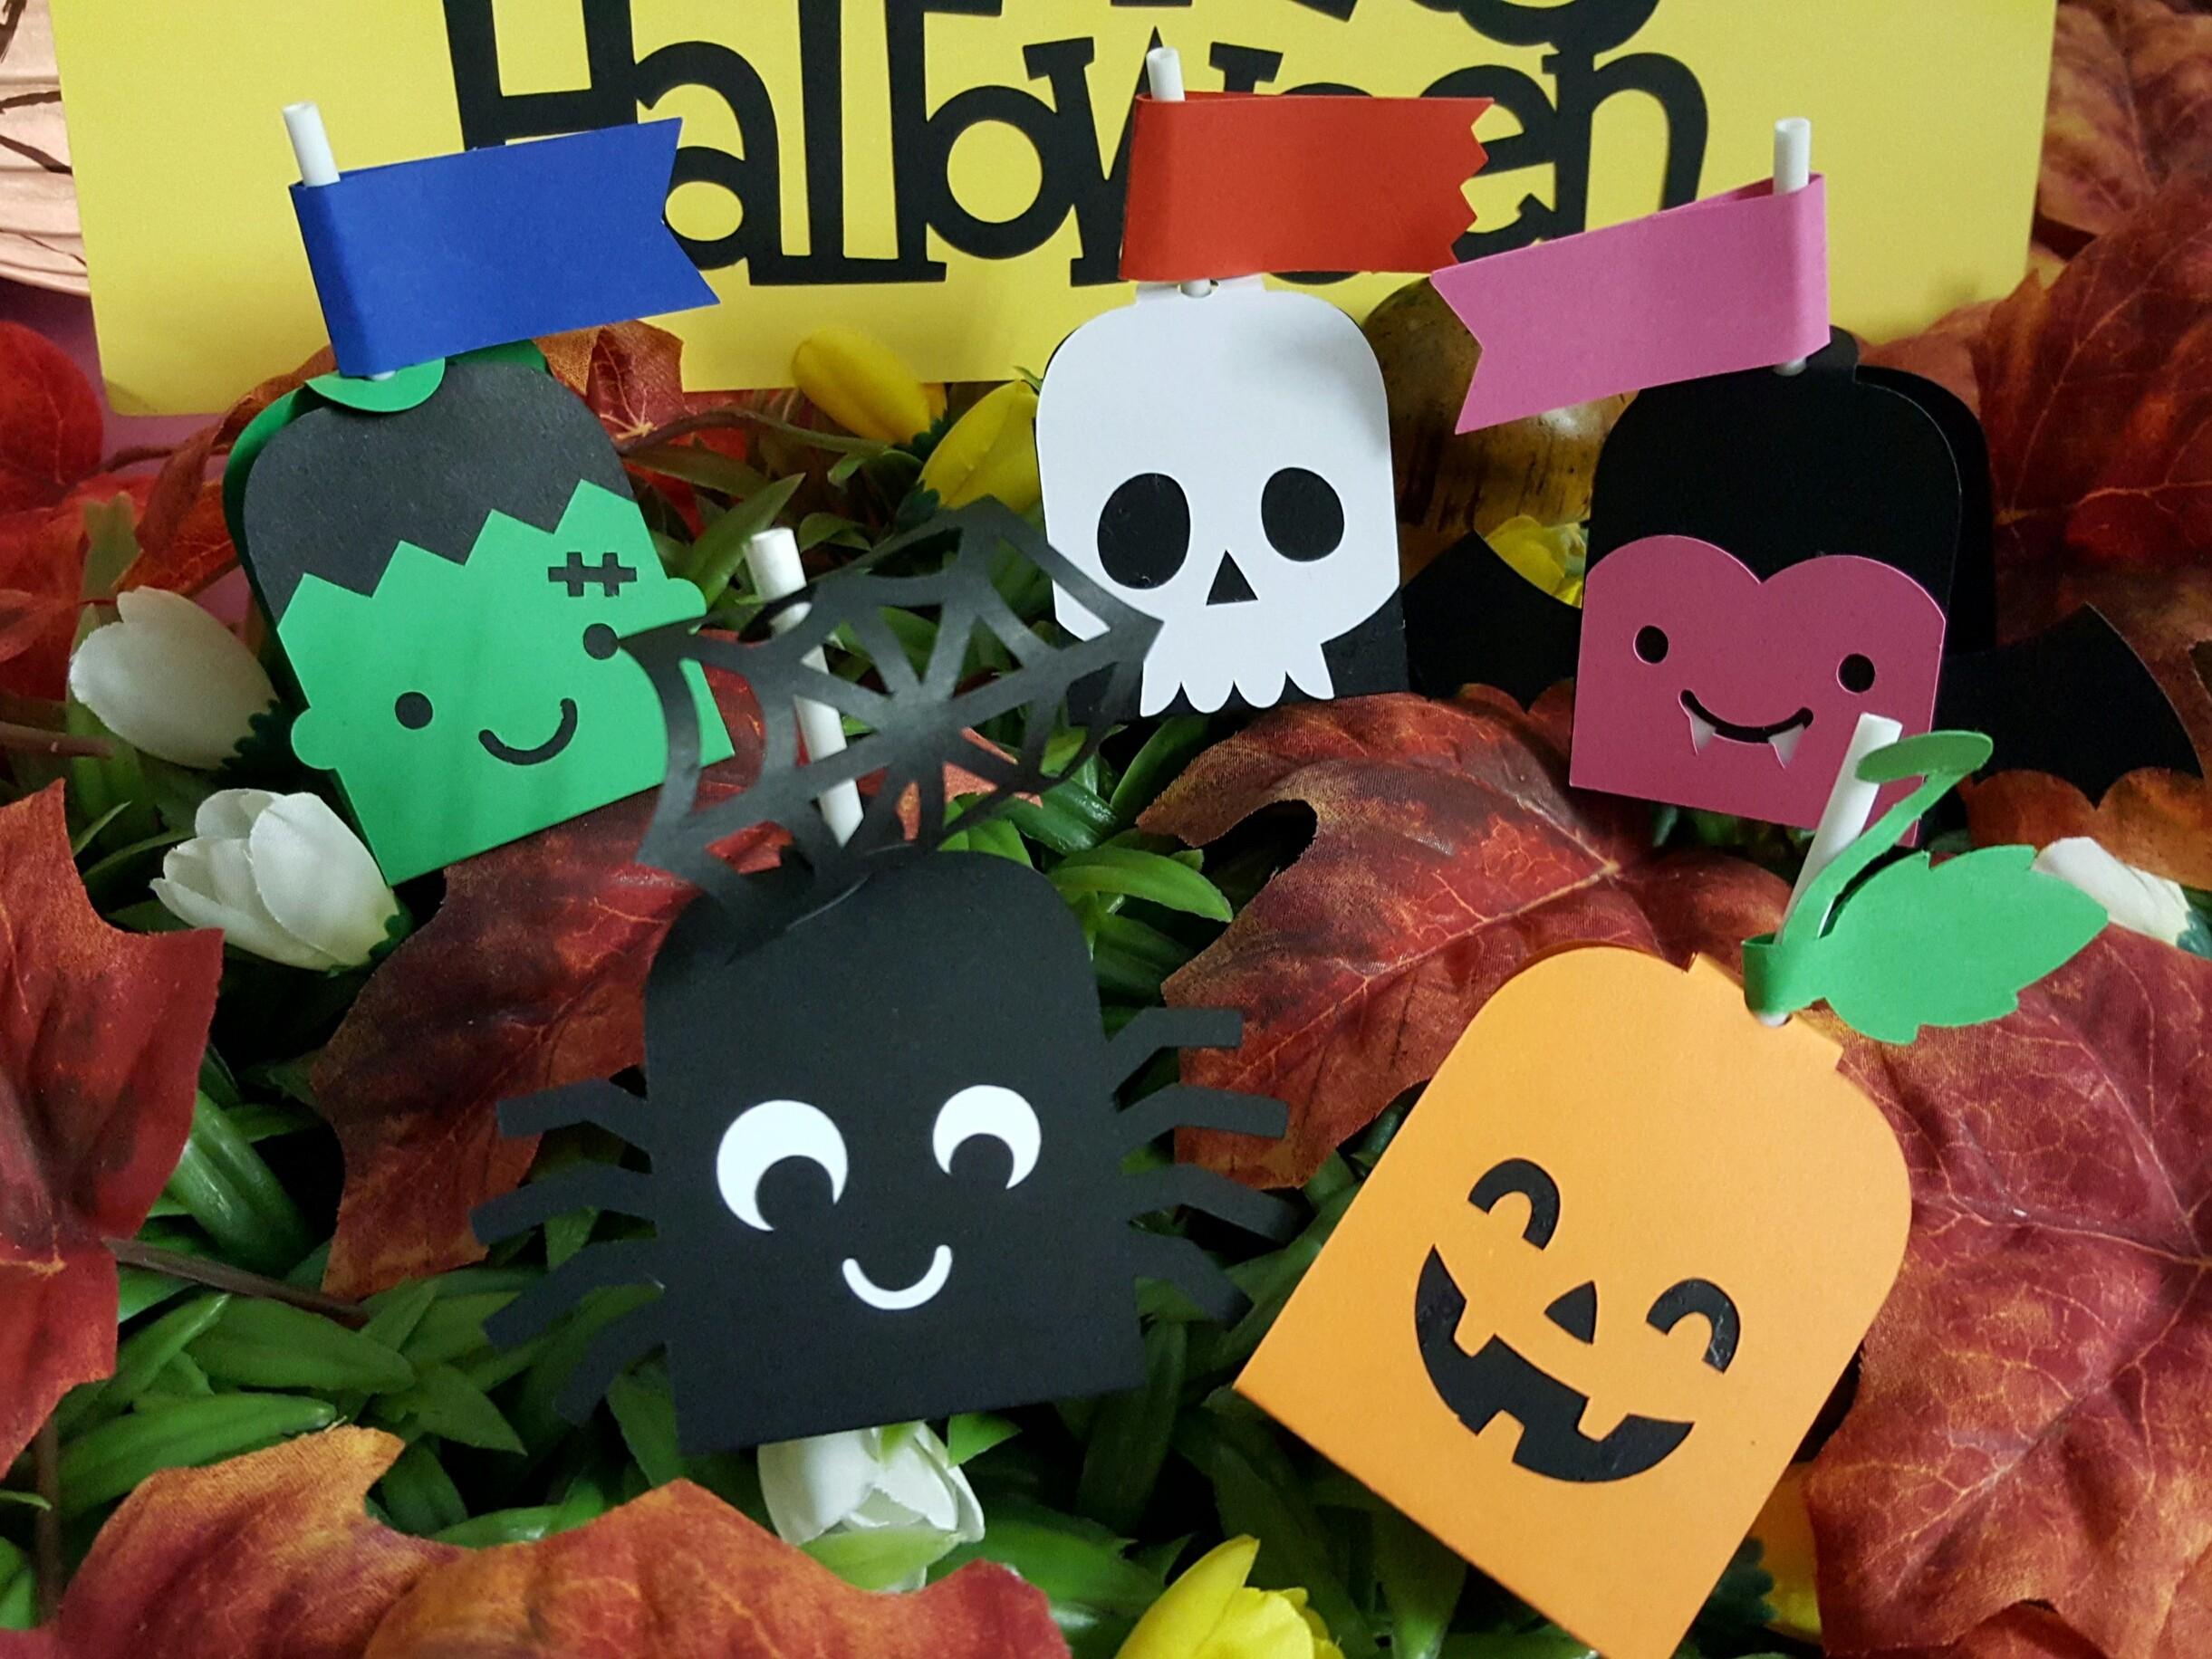 Festa Halloween Idee.Halloween Idee Festa Per Bambini C Era Una Mamma